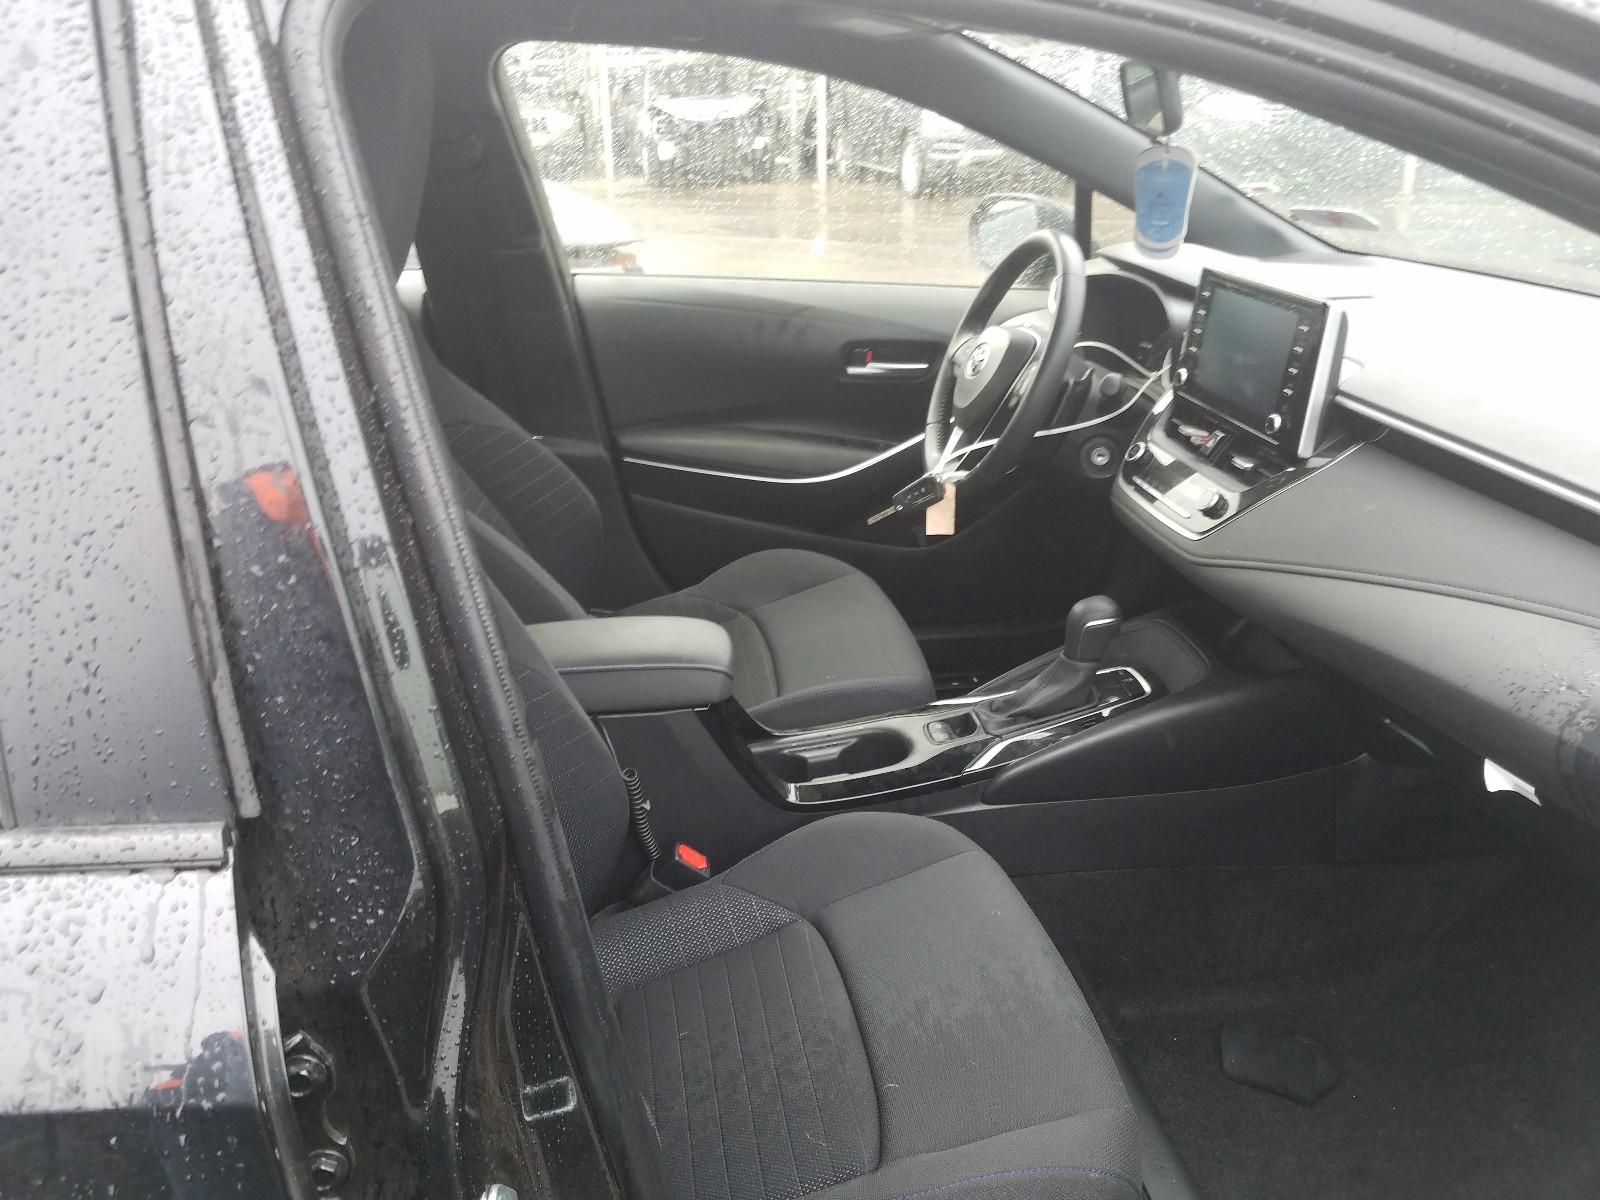 JTDS4RCE3LJ035185 - 2020 Toyota Corolla Se 2.0L close up View